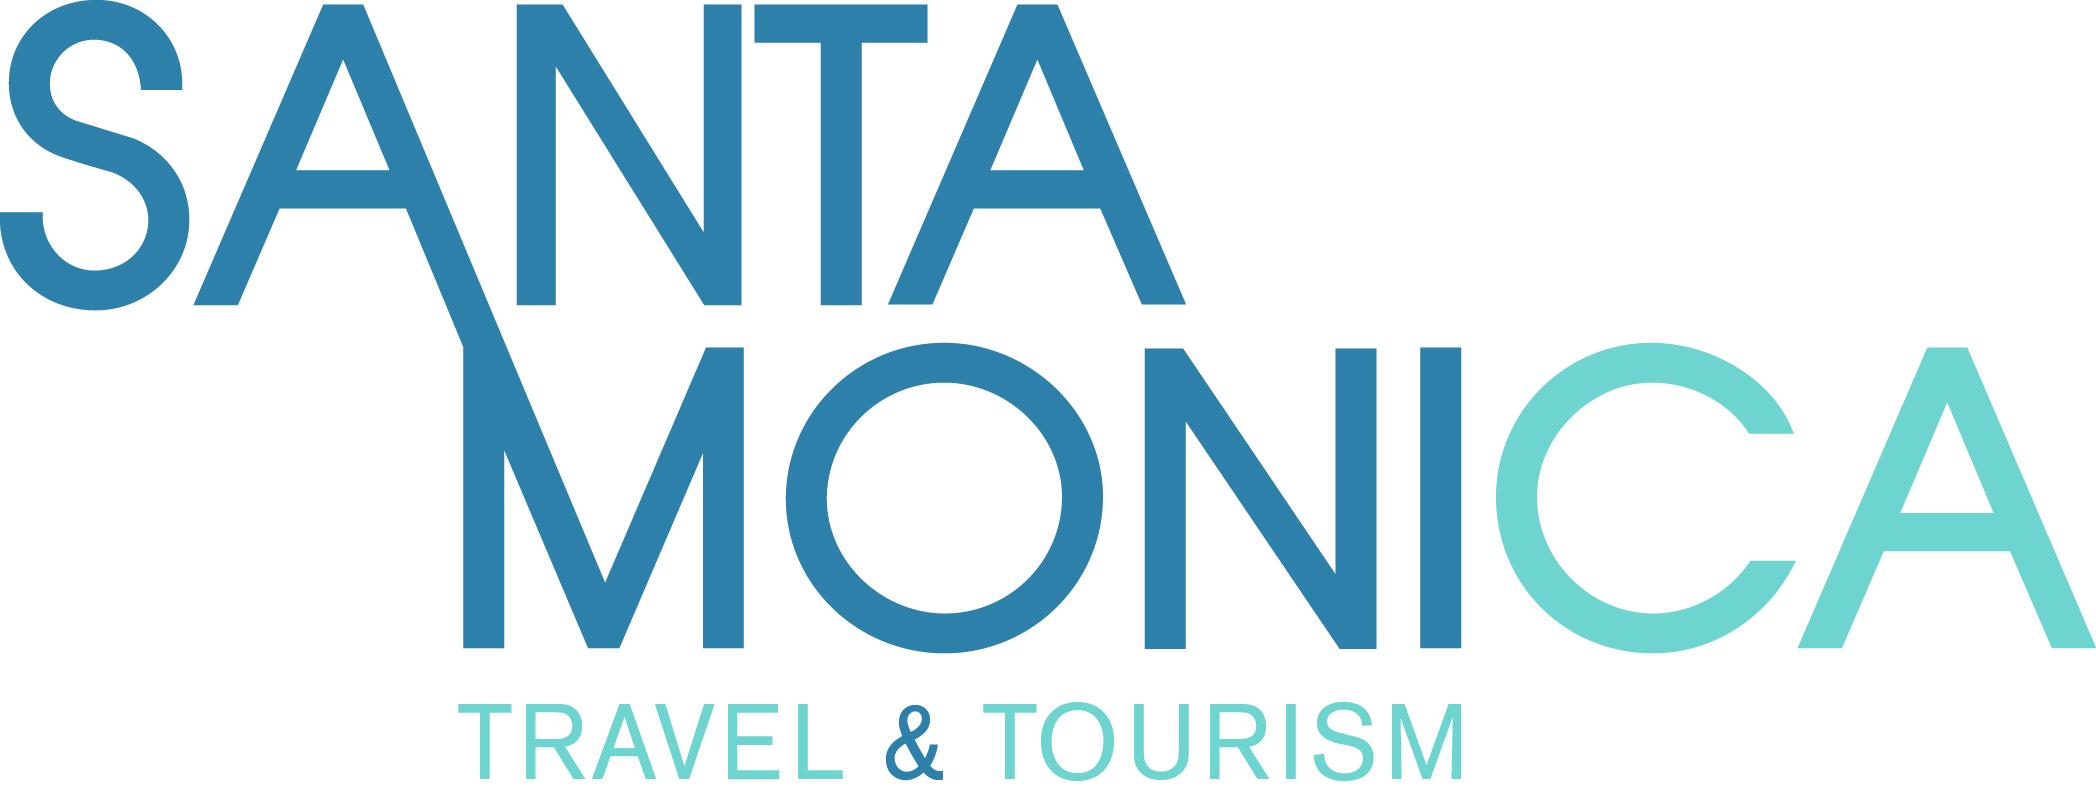 Santa Monica Hotel Deals Tourism & Travel